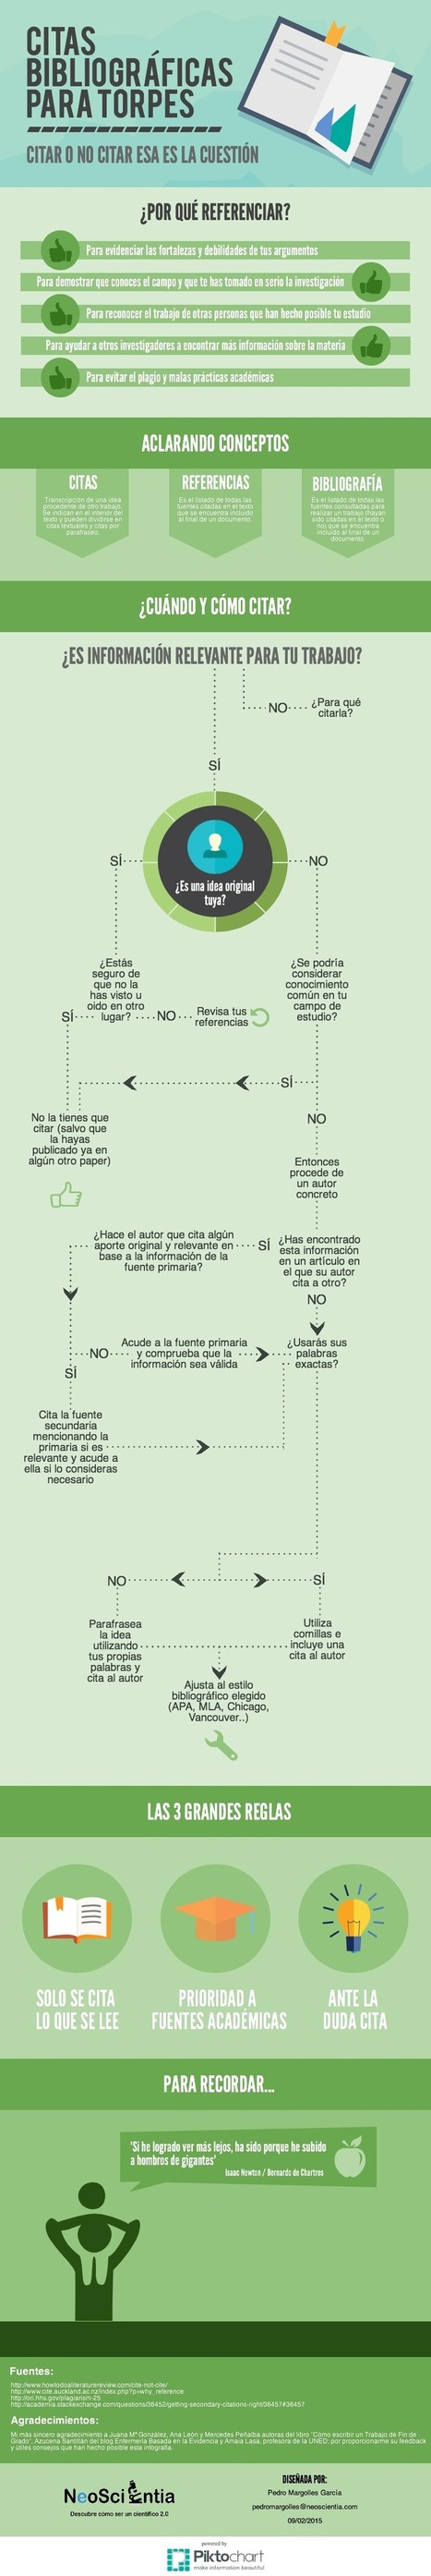 Citas bibliográficas para torpes #infografia│@pedromargolles | Bibliotecas Escolares Argentinas | Scoop.it